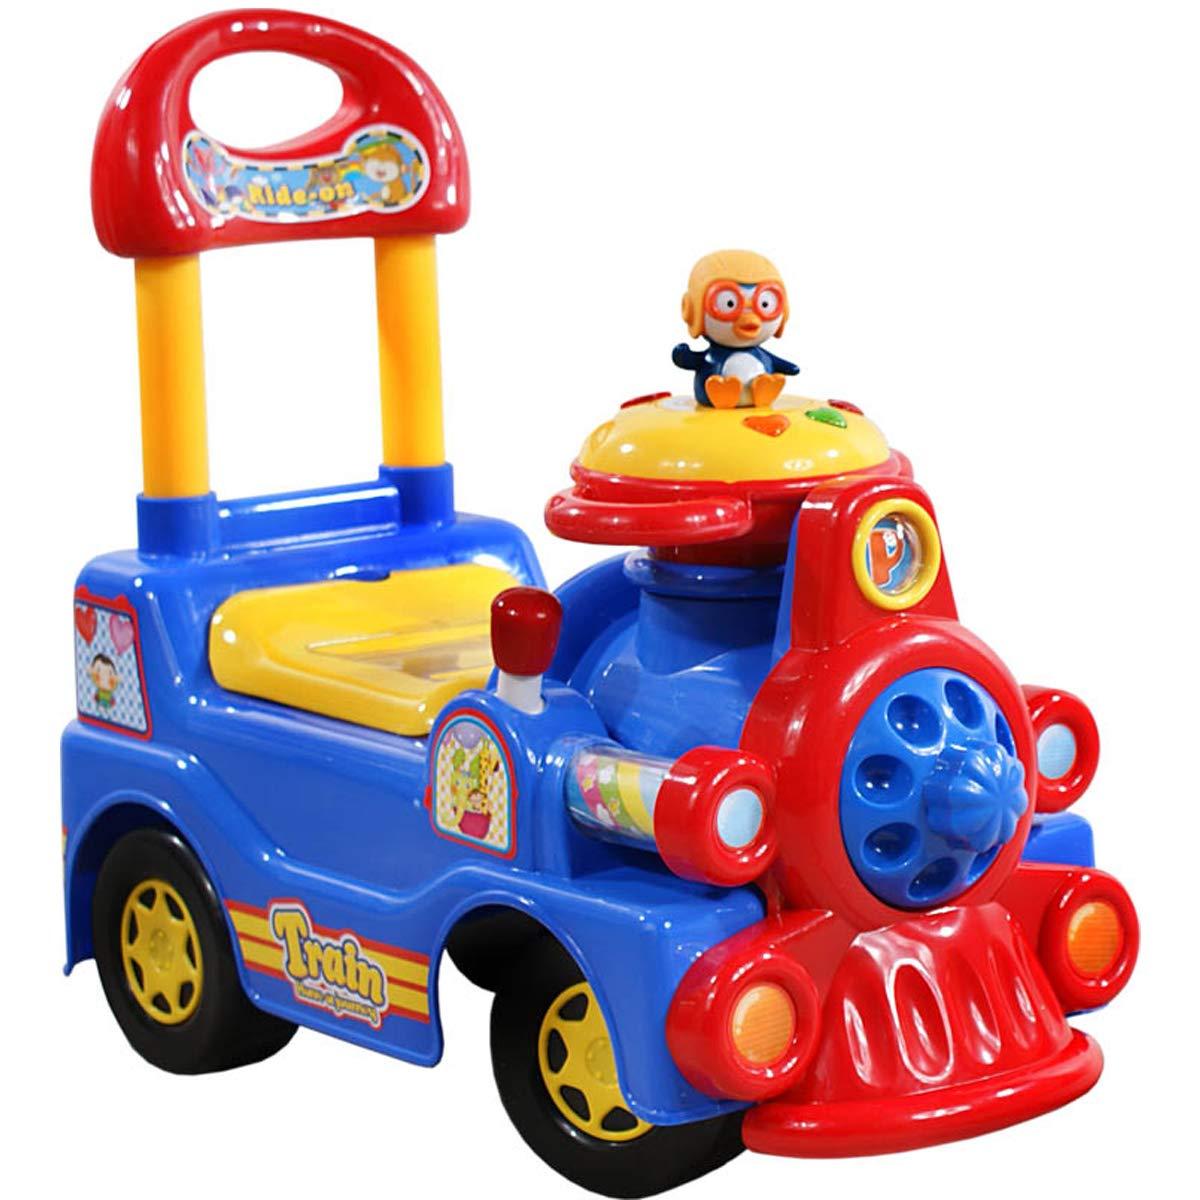 422 Rutscher Kinder Auto Zug Kinderauto Rutschauto Aufsitz-Auto Kinderfahrzeug (Blau) scalesport 616A